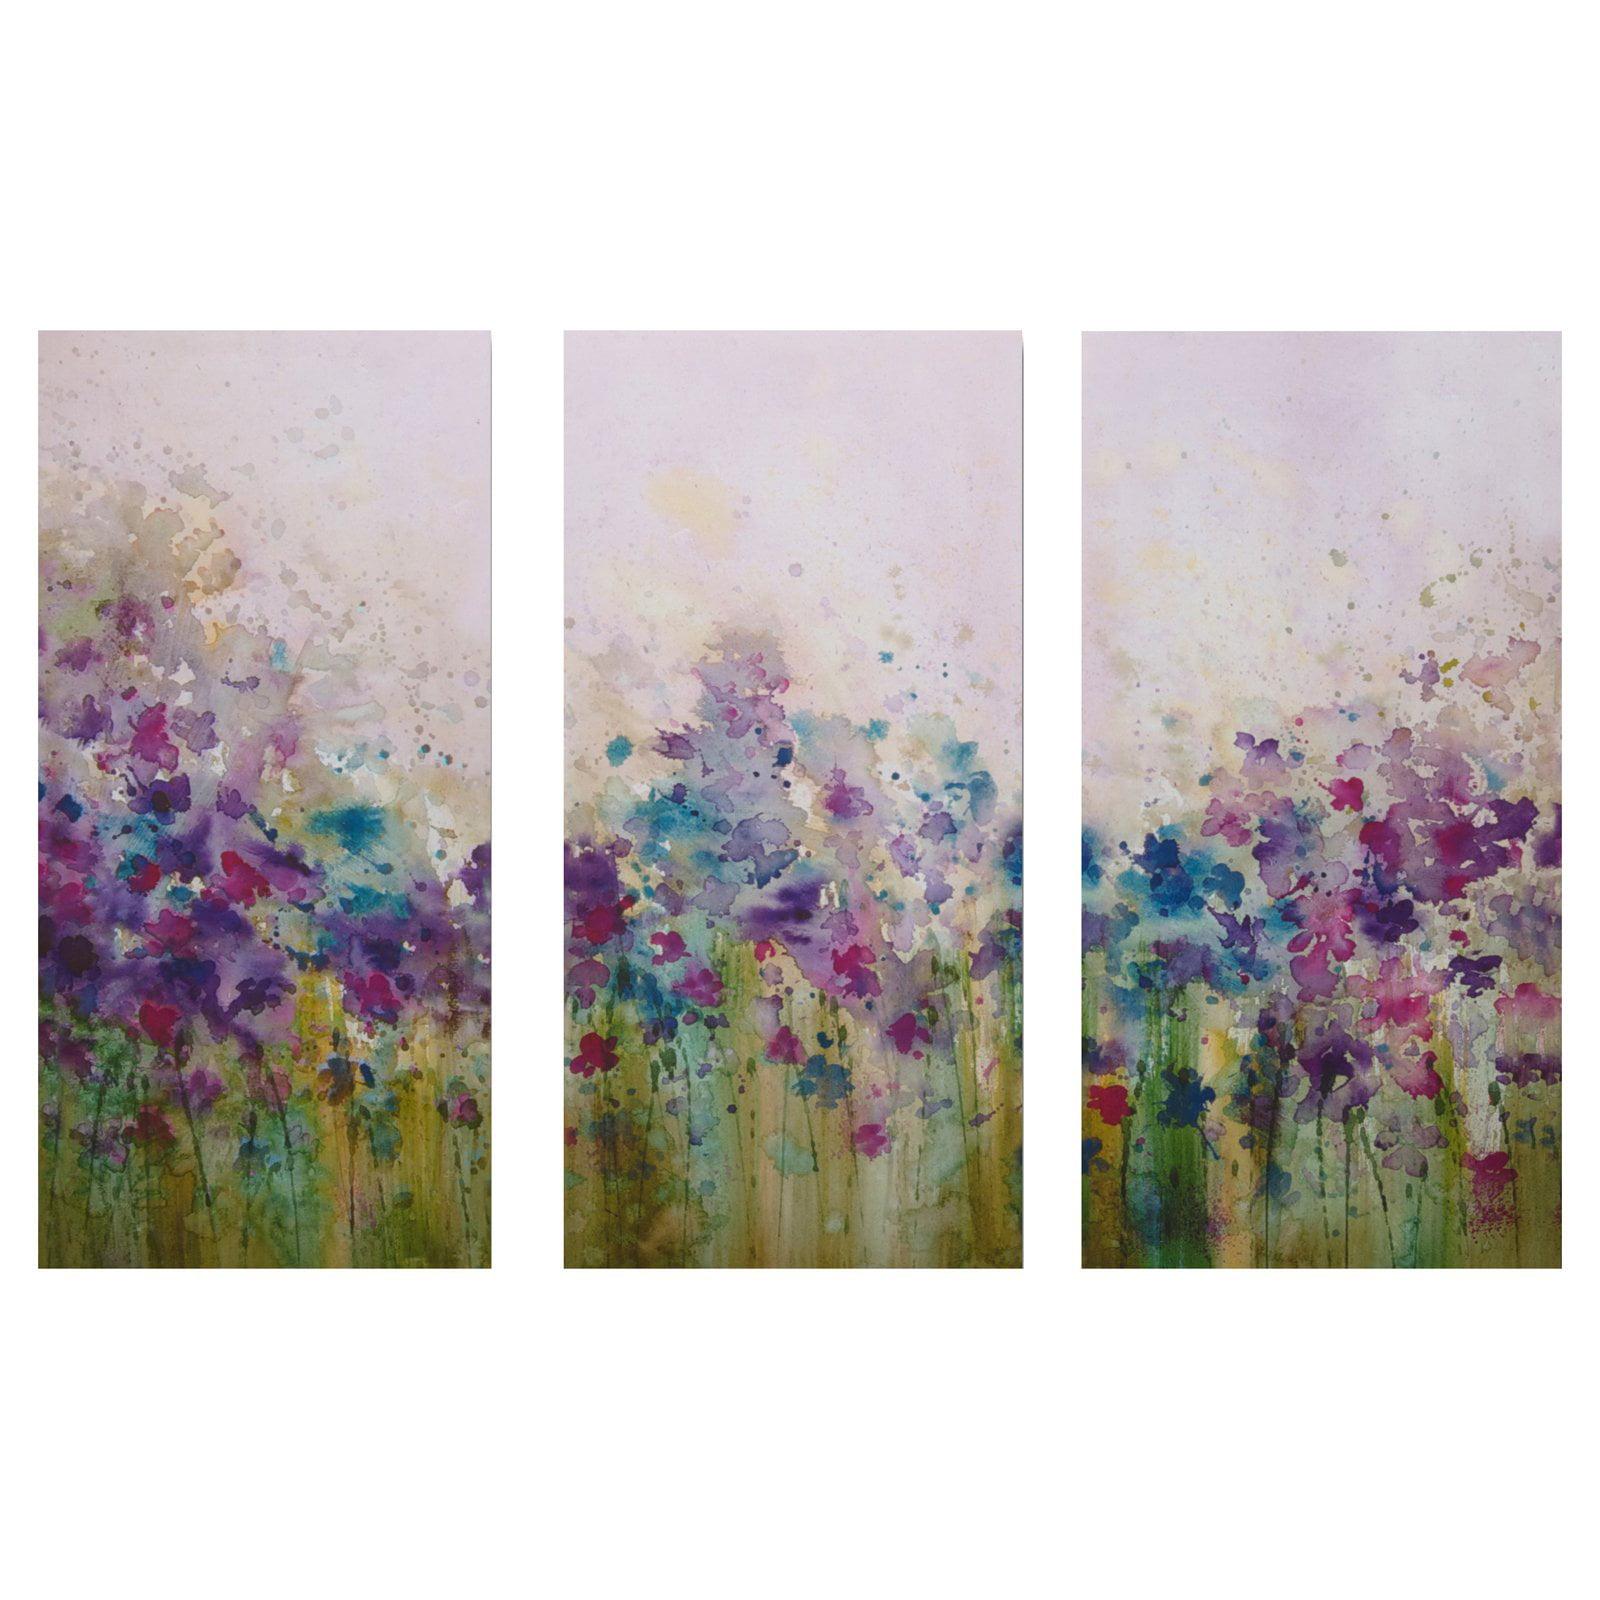 Watercolor Meadow Canvas Wall Art - Set of 3 - 12W x 24H in.ea.